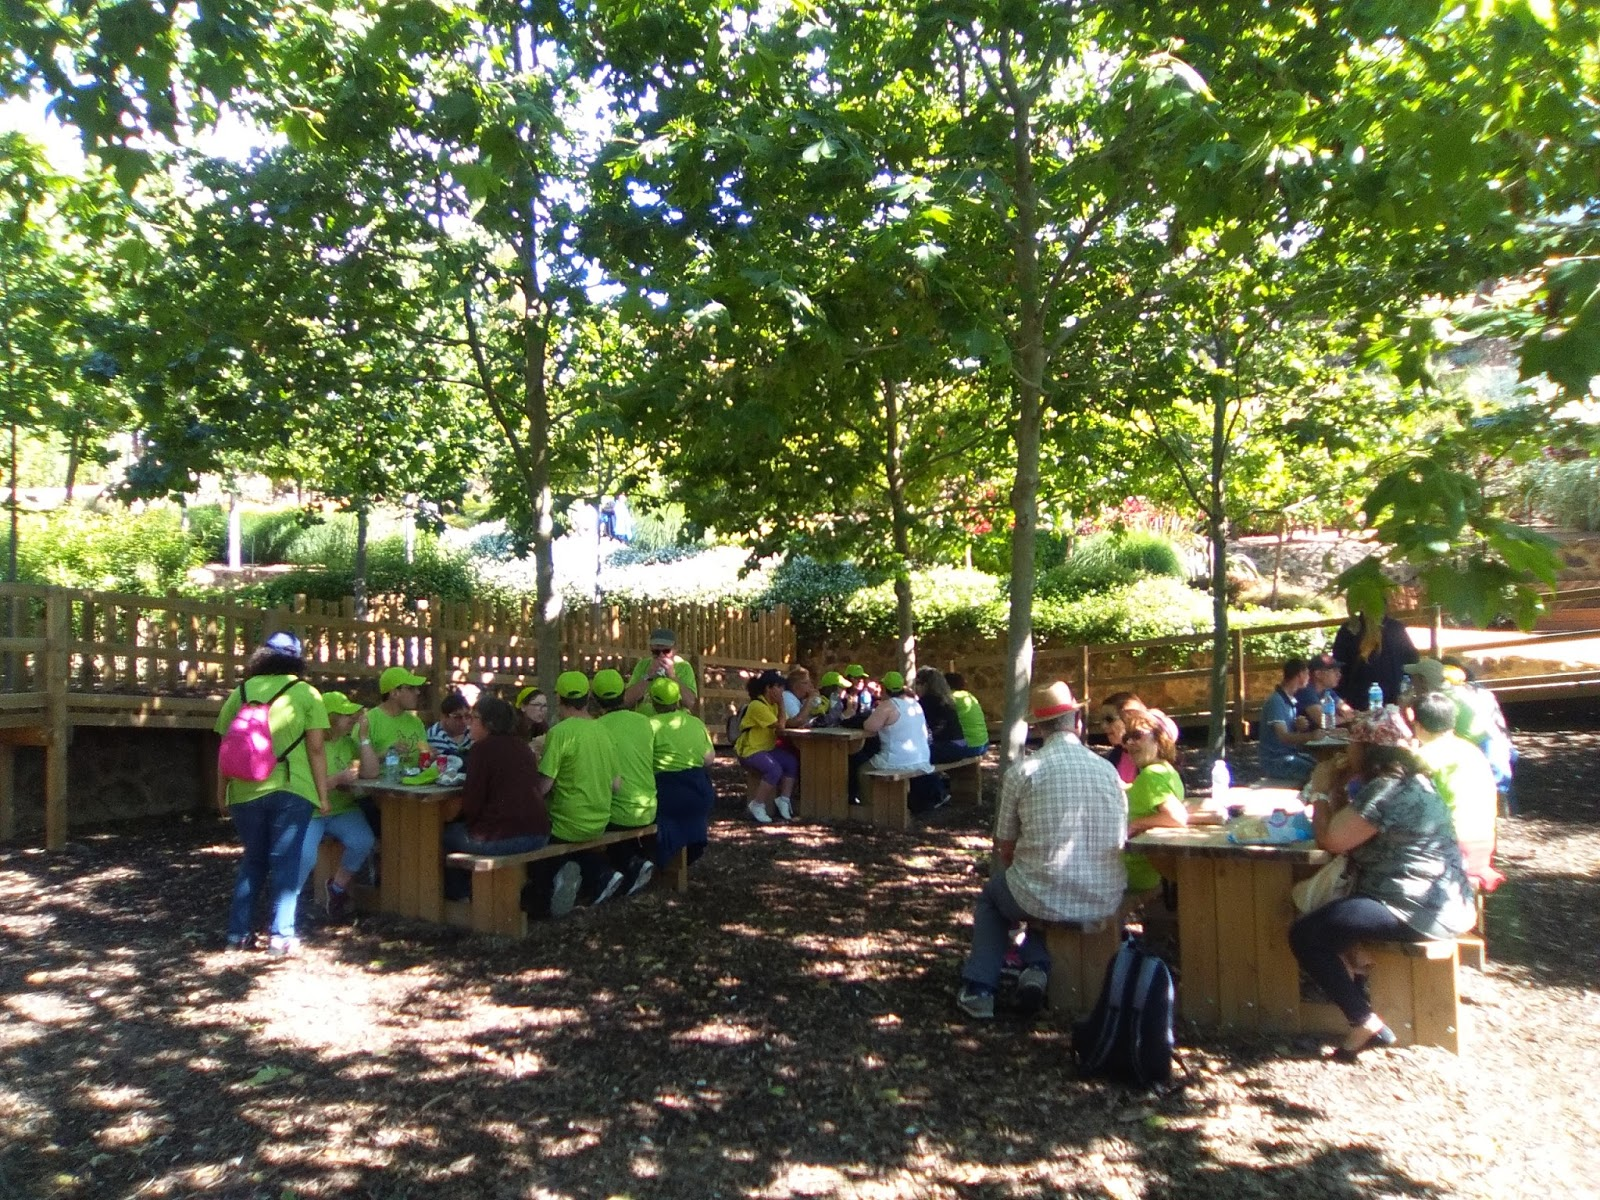 Afatram excursi als jardins del cap roig for Jardines cap roig